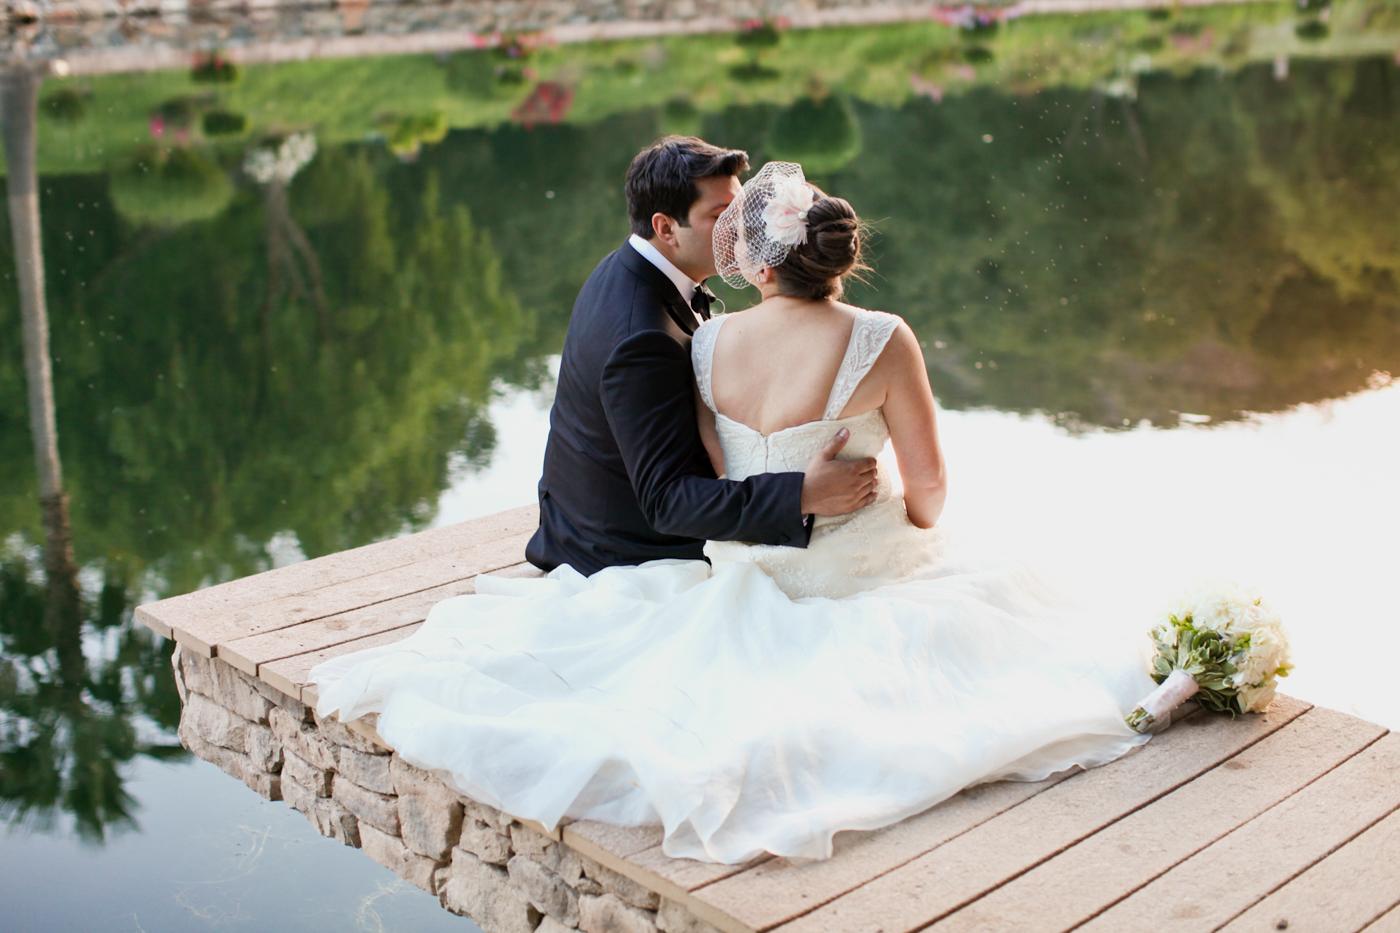 LOS WILLOWS WEDDING — Lovisa Photo